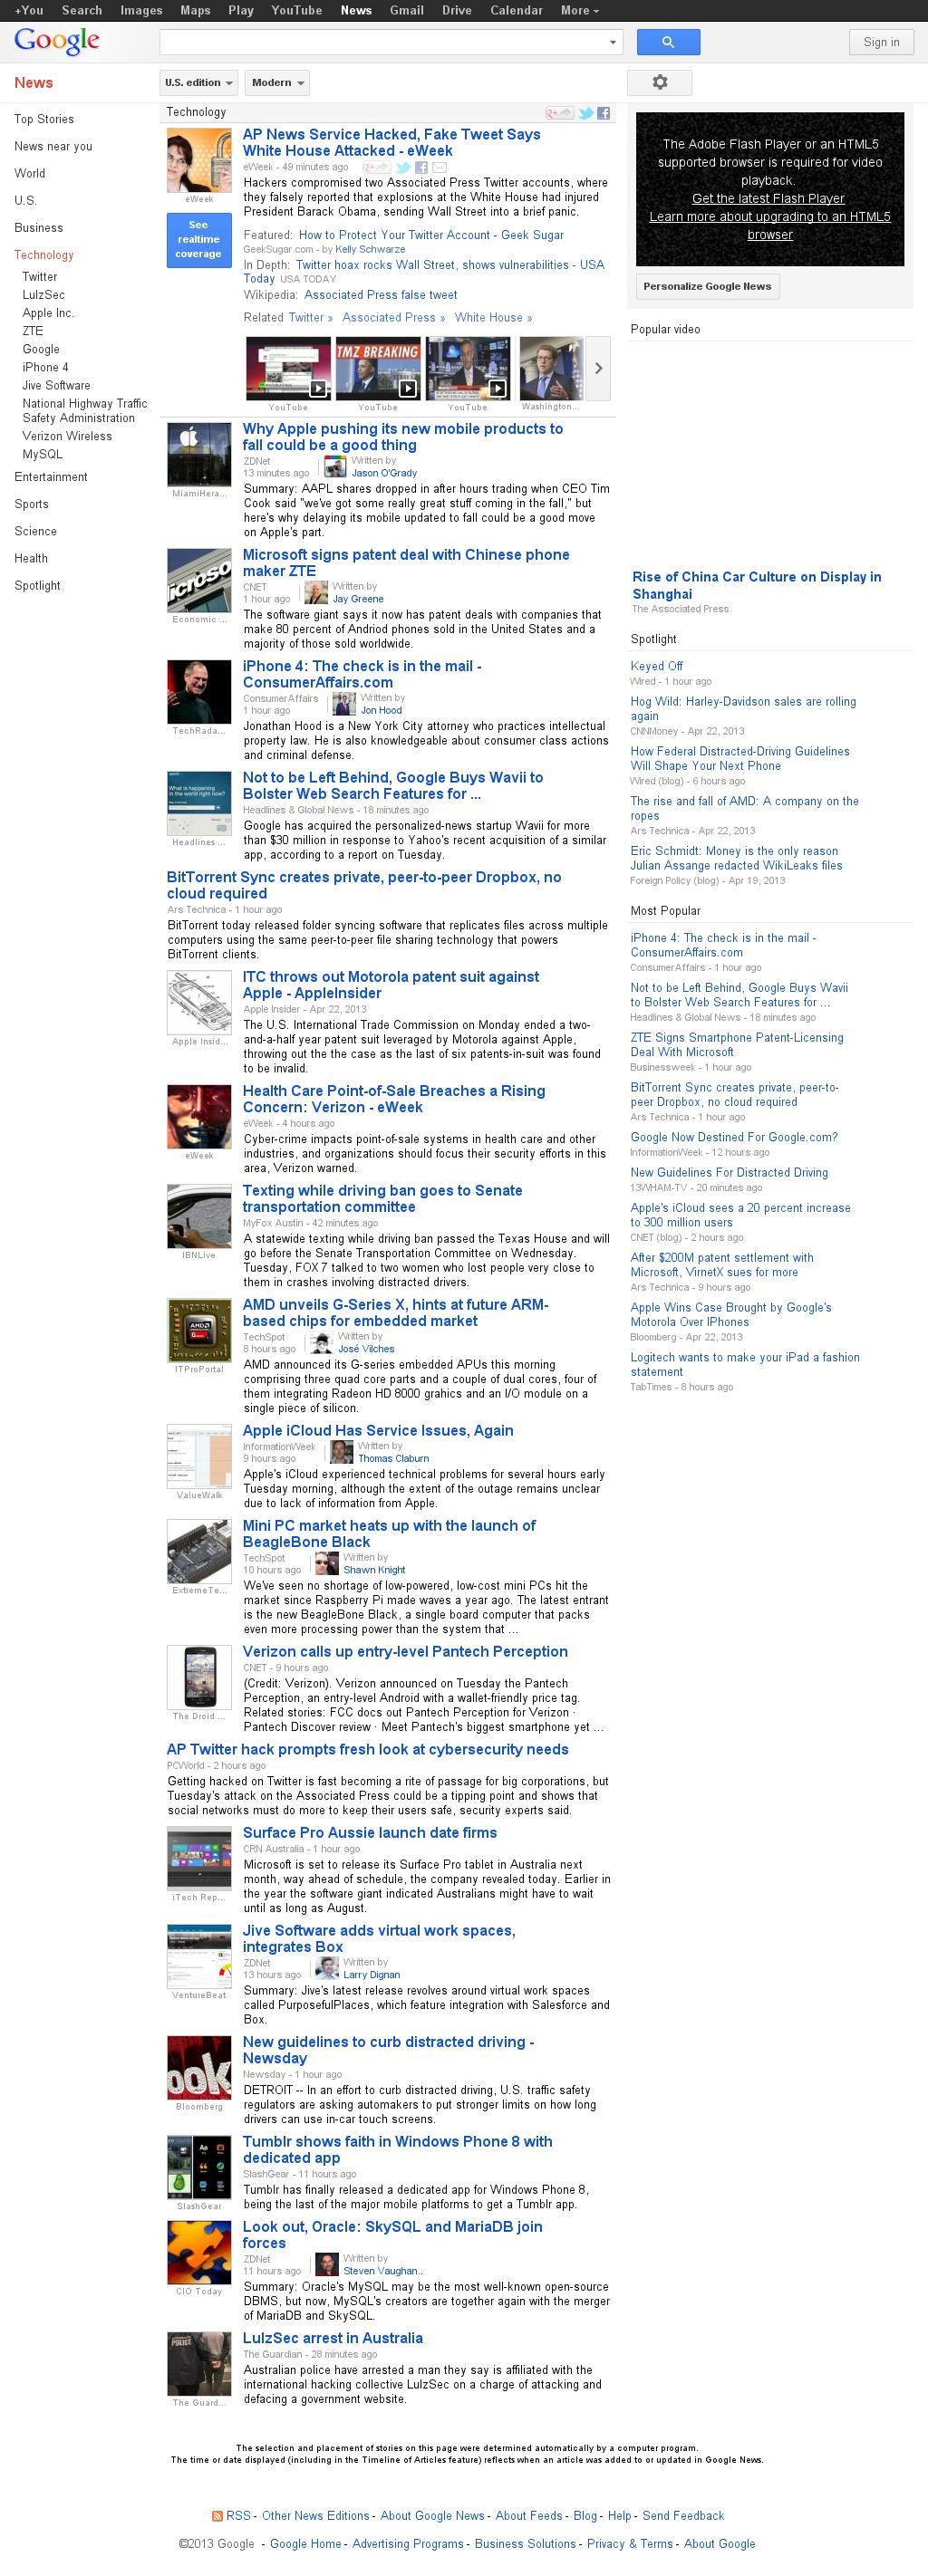 Google News: Technology at Wednesday April 24, 2013, 4:09 a.m. UTC